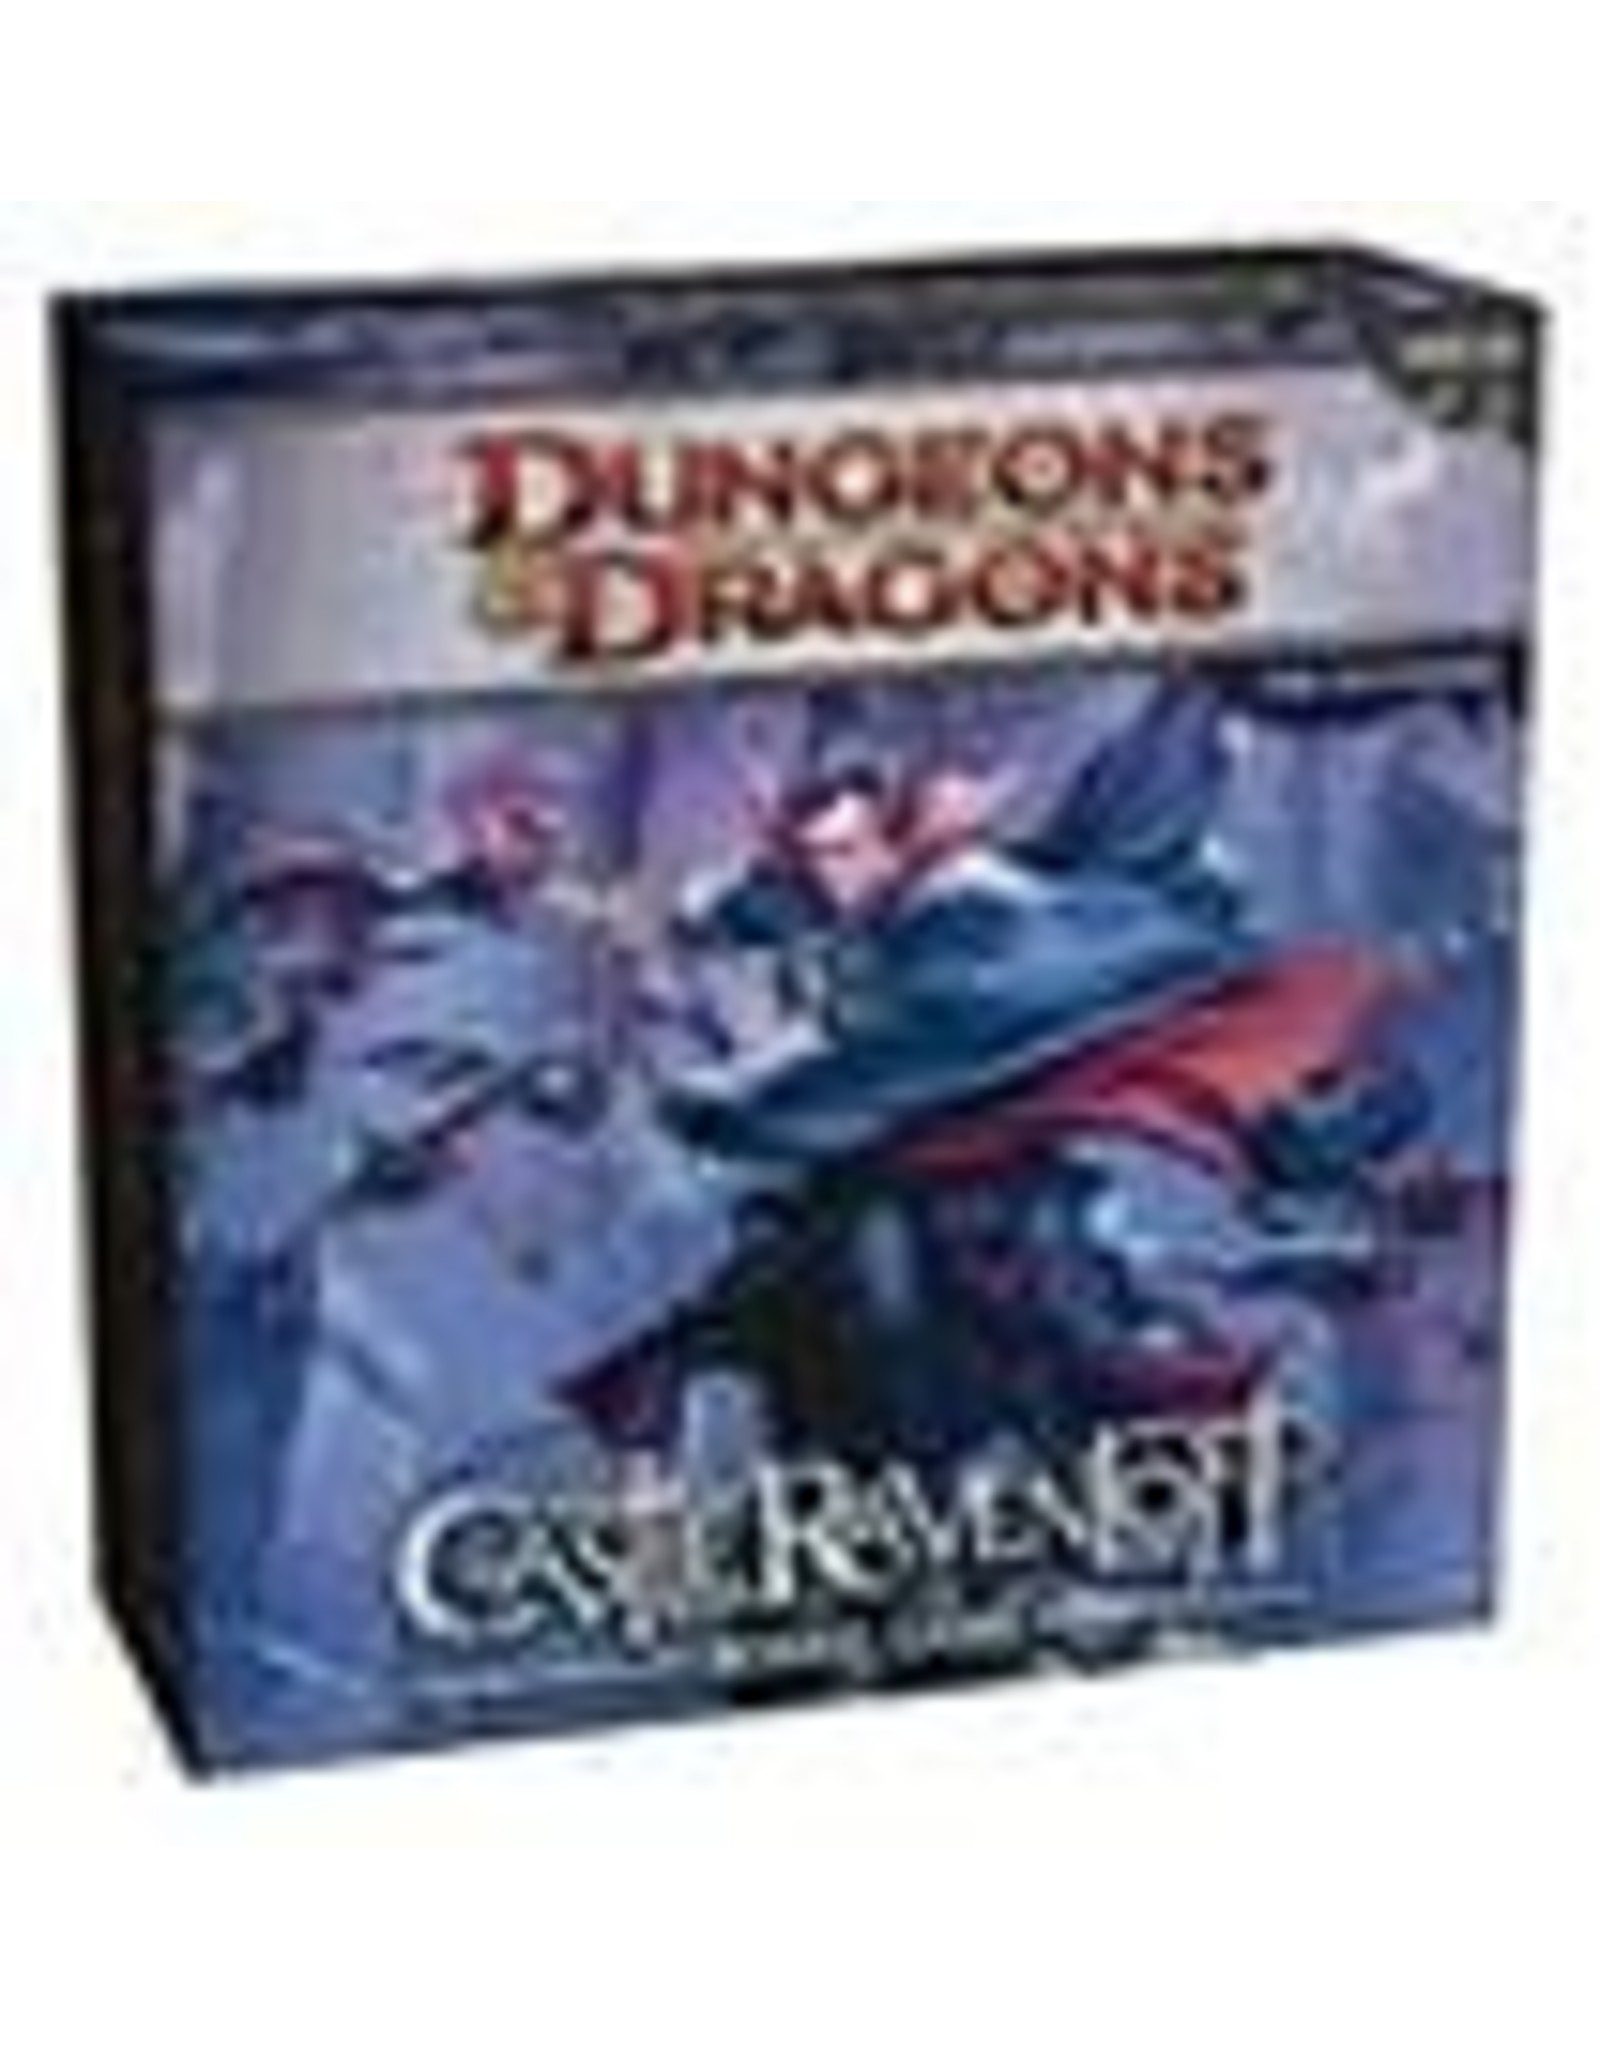 Wizards of the Coast Castle Ravenloft (boardgame)